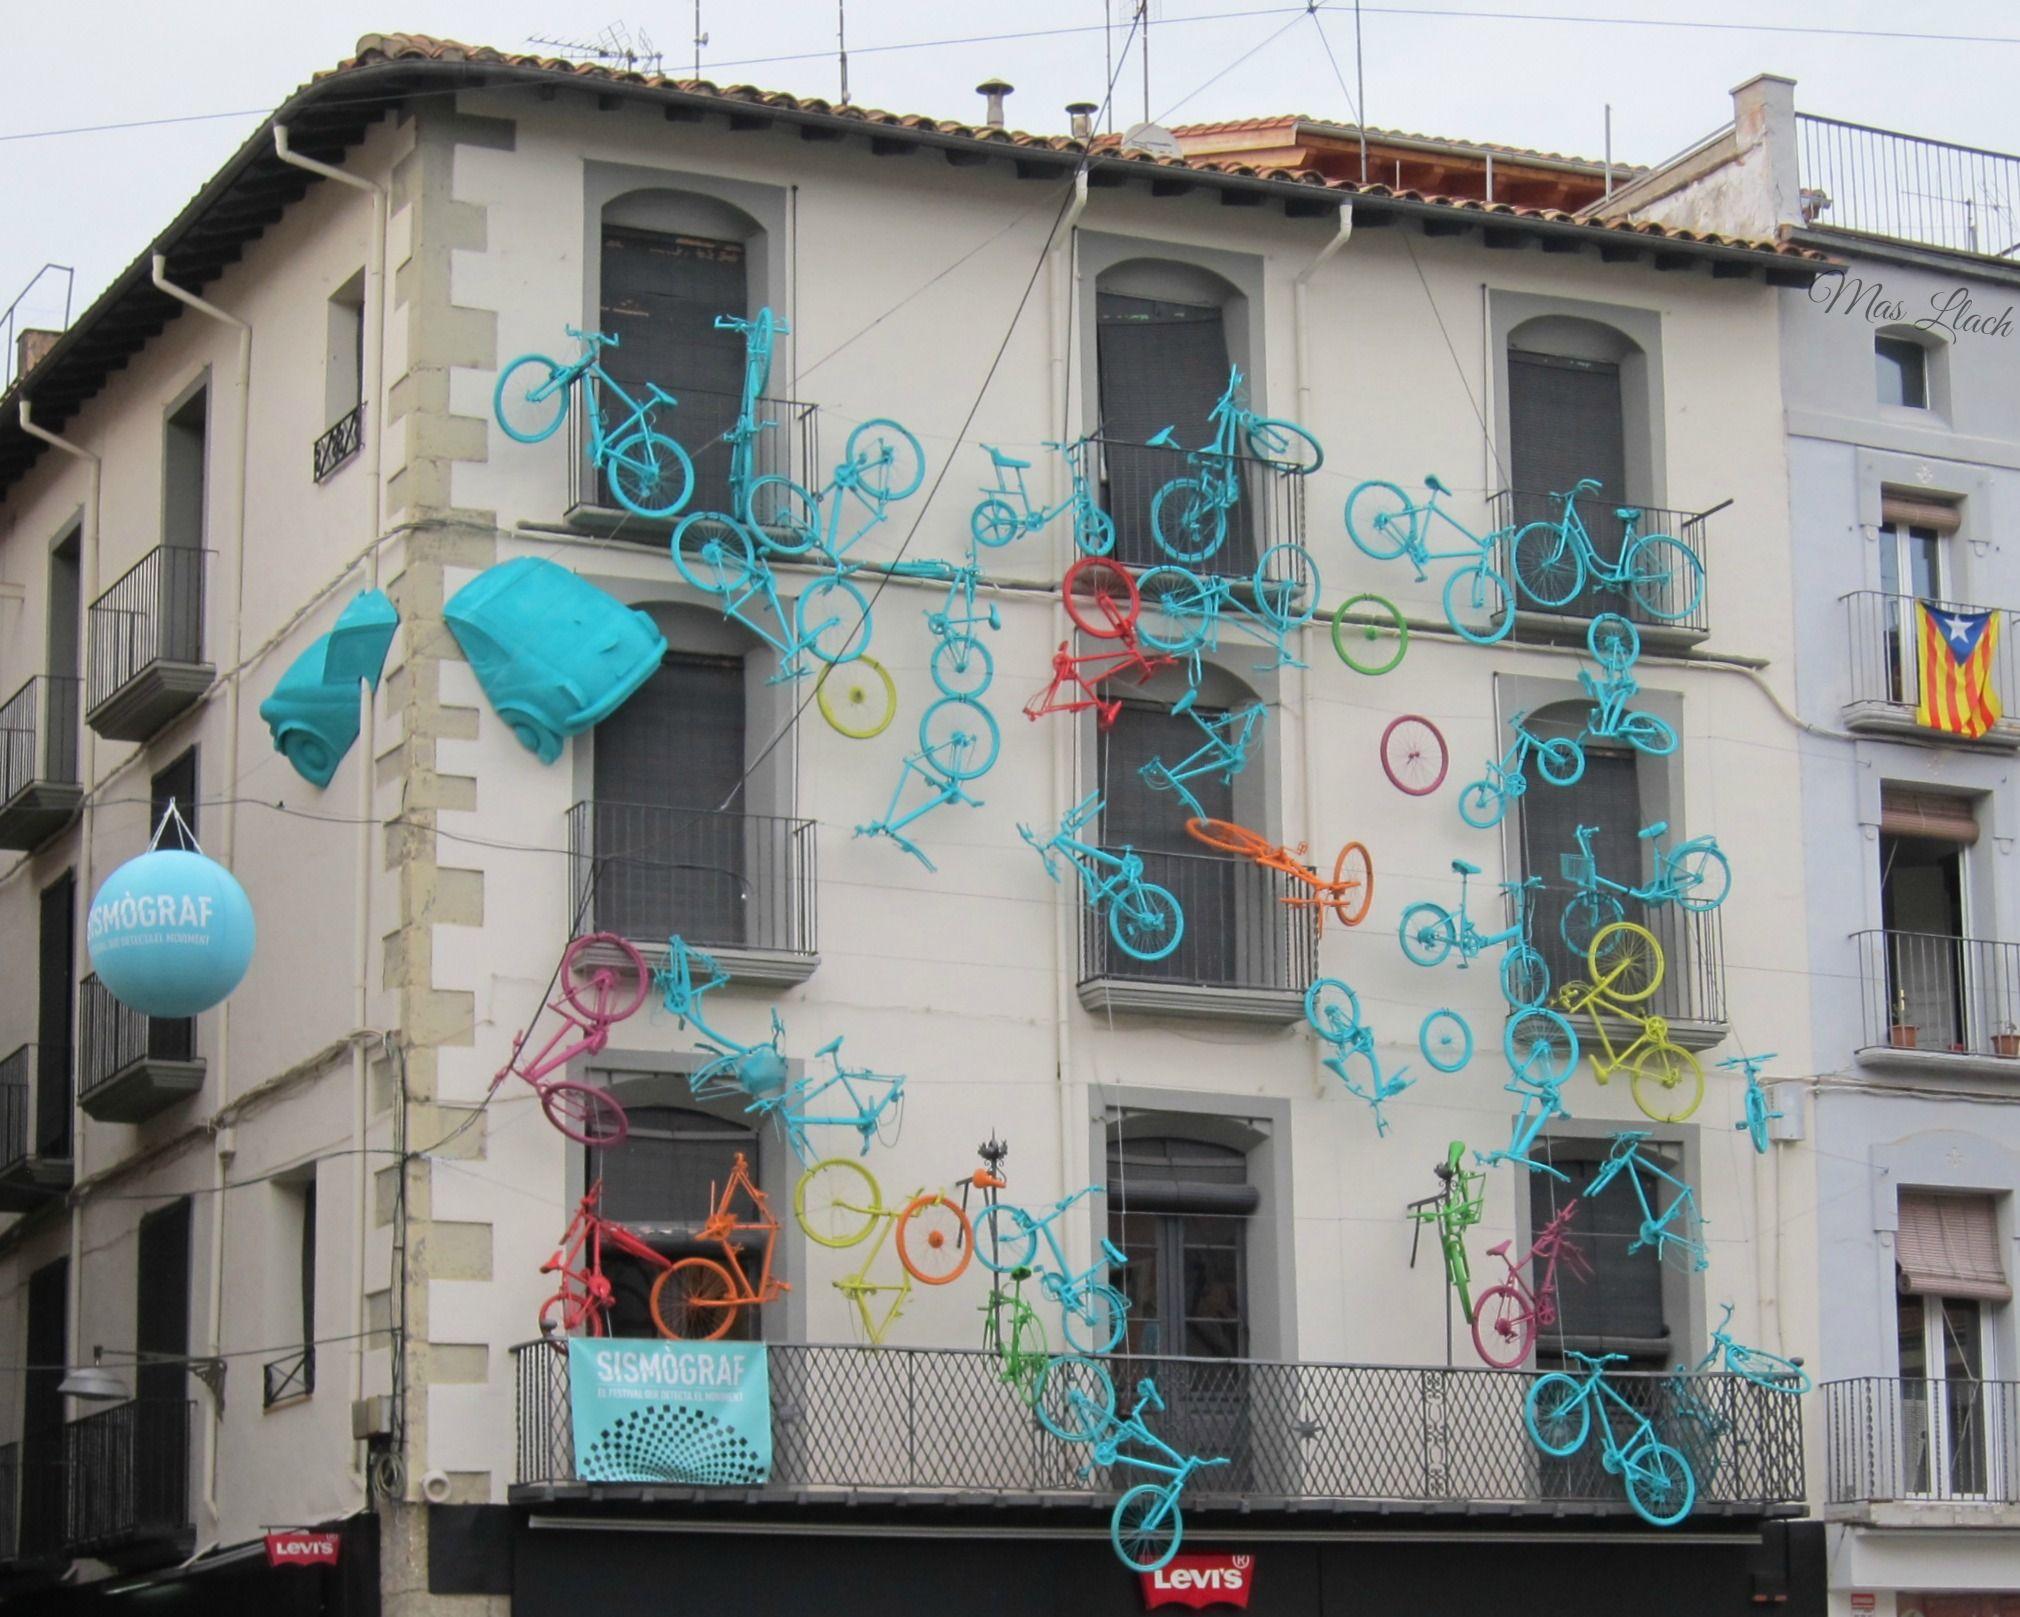 Sismògraf 2015 - Olot _ Girona (Plaça major)